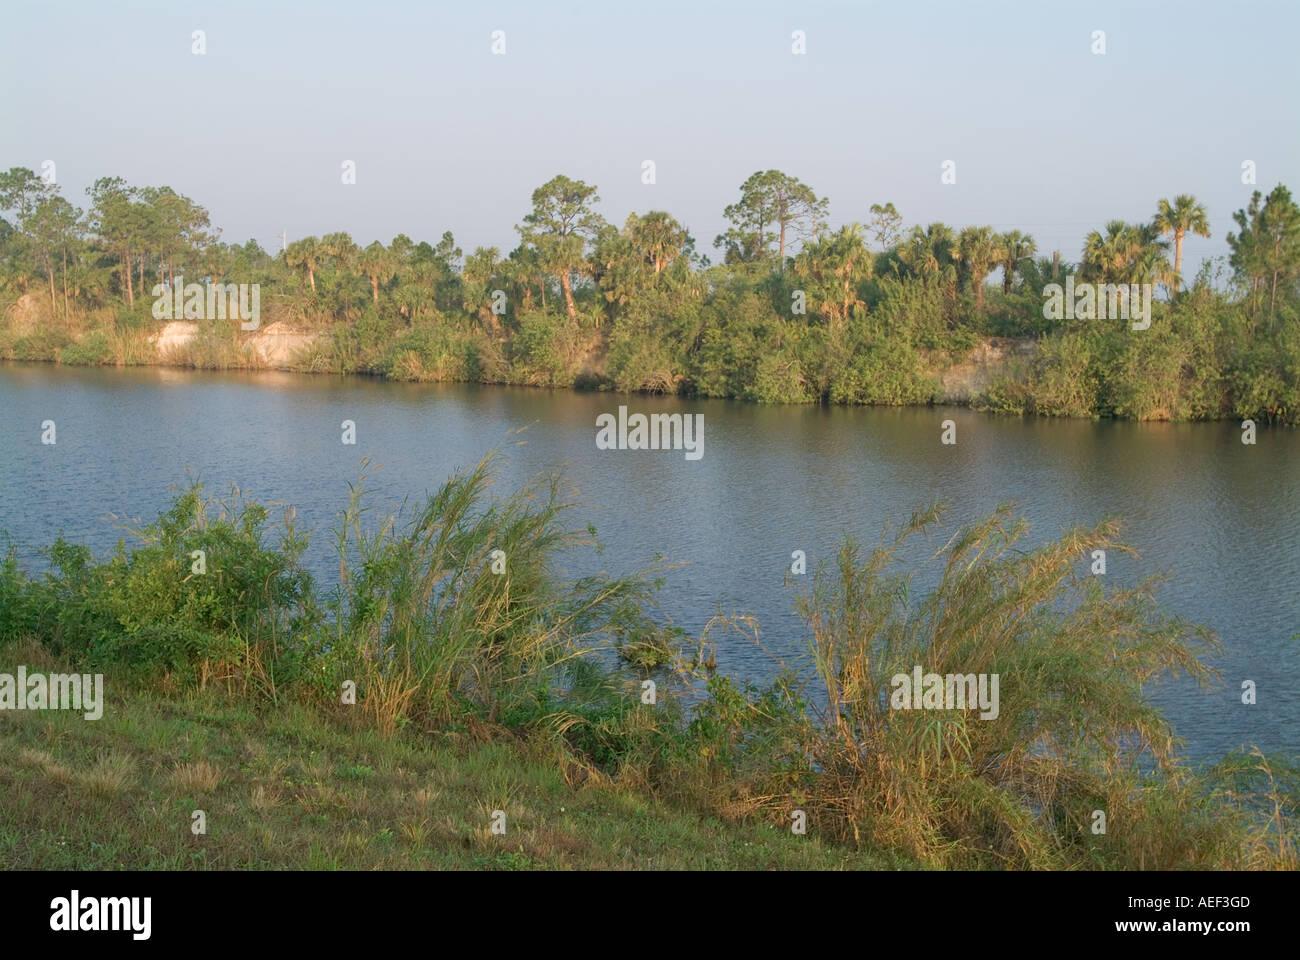 C 44 C44 canal Okeechobee Waterway Martin County South Florida - Stock Image